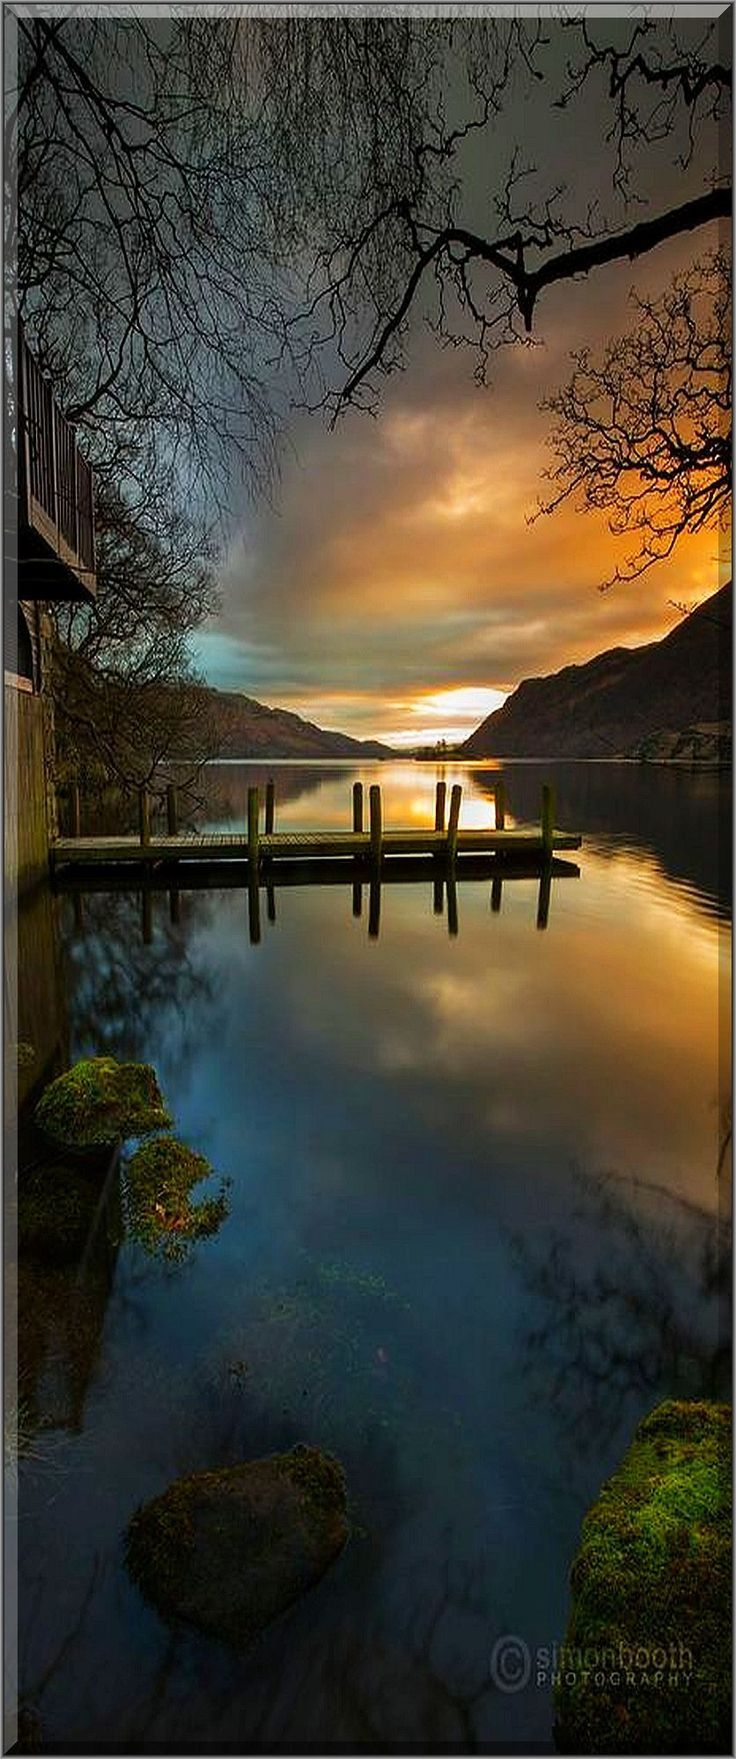 Ullswater Boathouse, Lake District National Park - UK England #photo by Simon Booth #landscape nature sunset reflection lake  Aergo Wanderlust Approved!